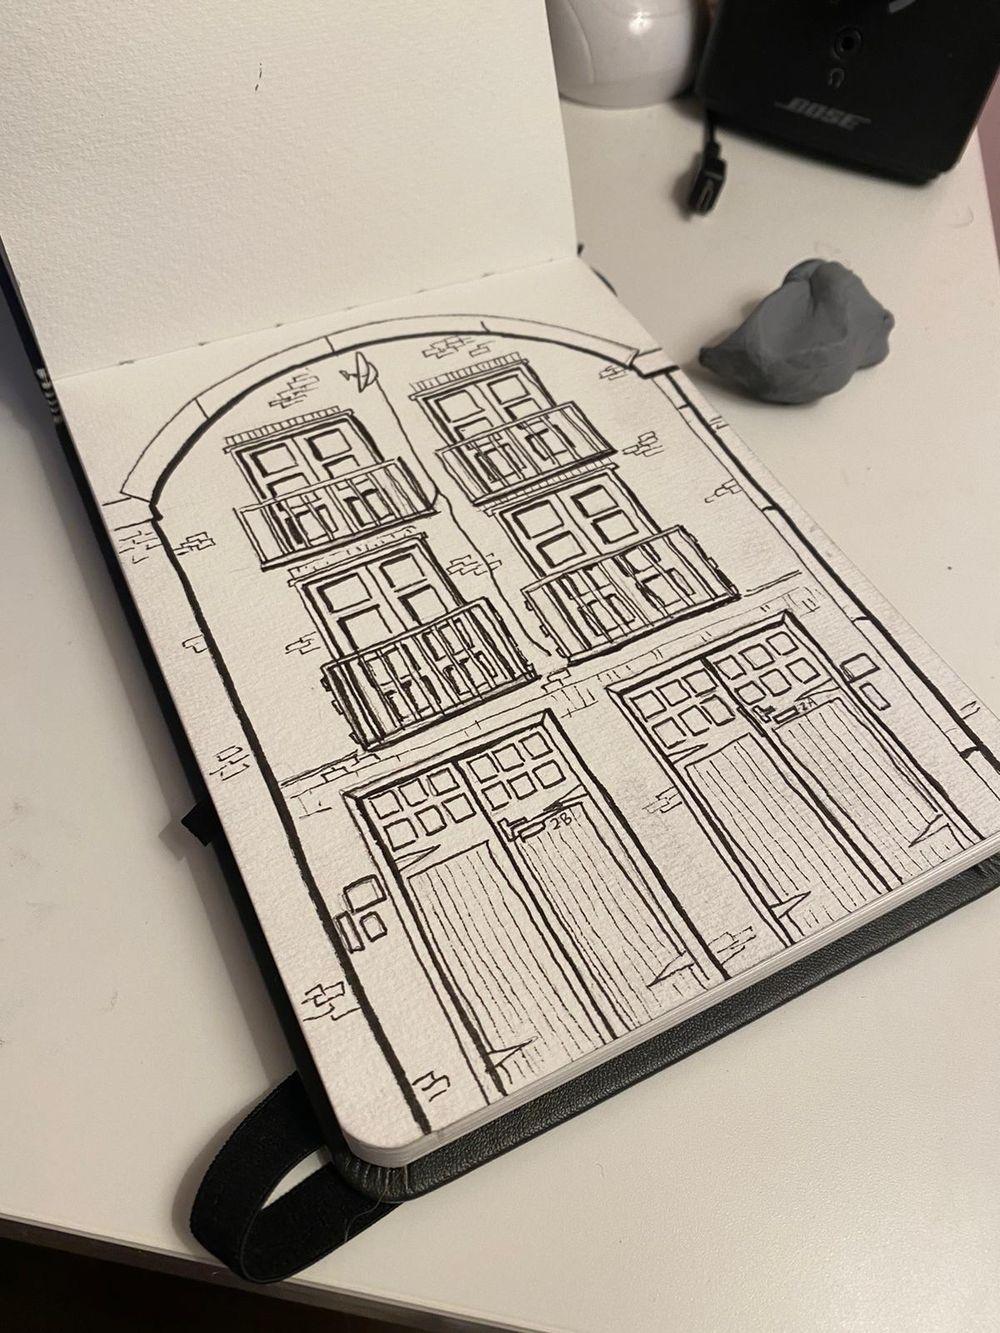 2A/2B Fenwick Pl   Urban Sketch & Paint - image 2 - student project